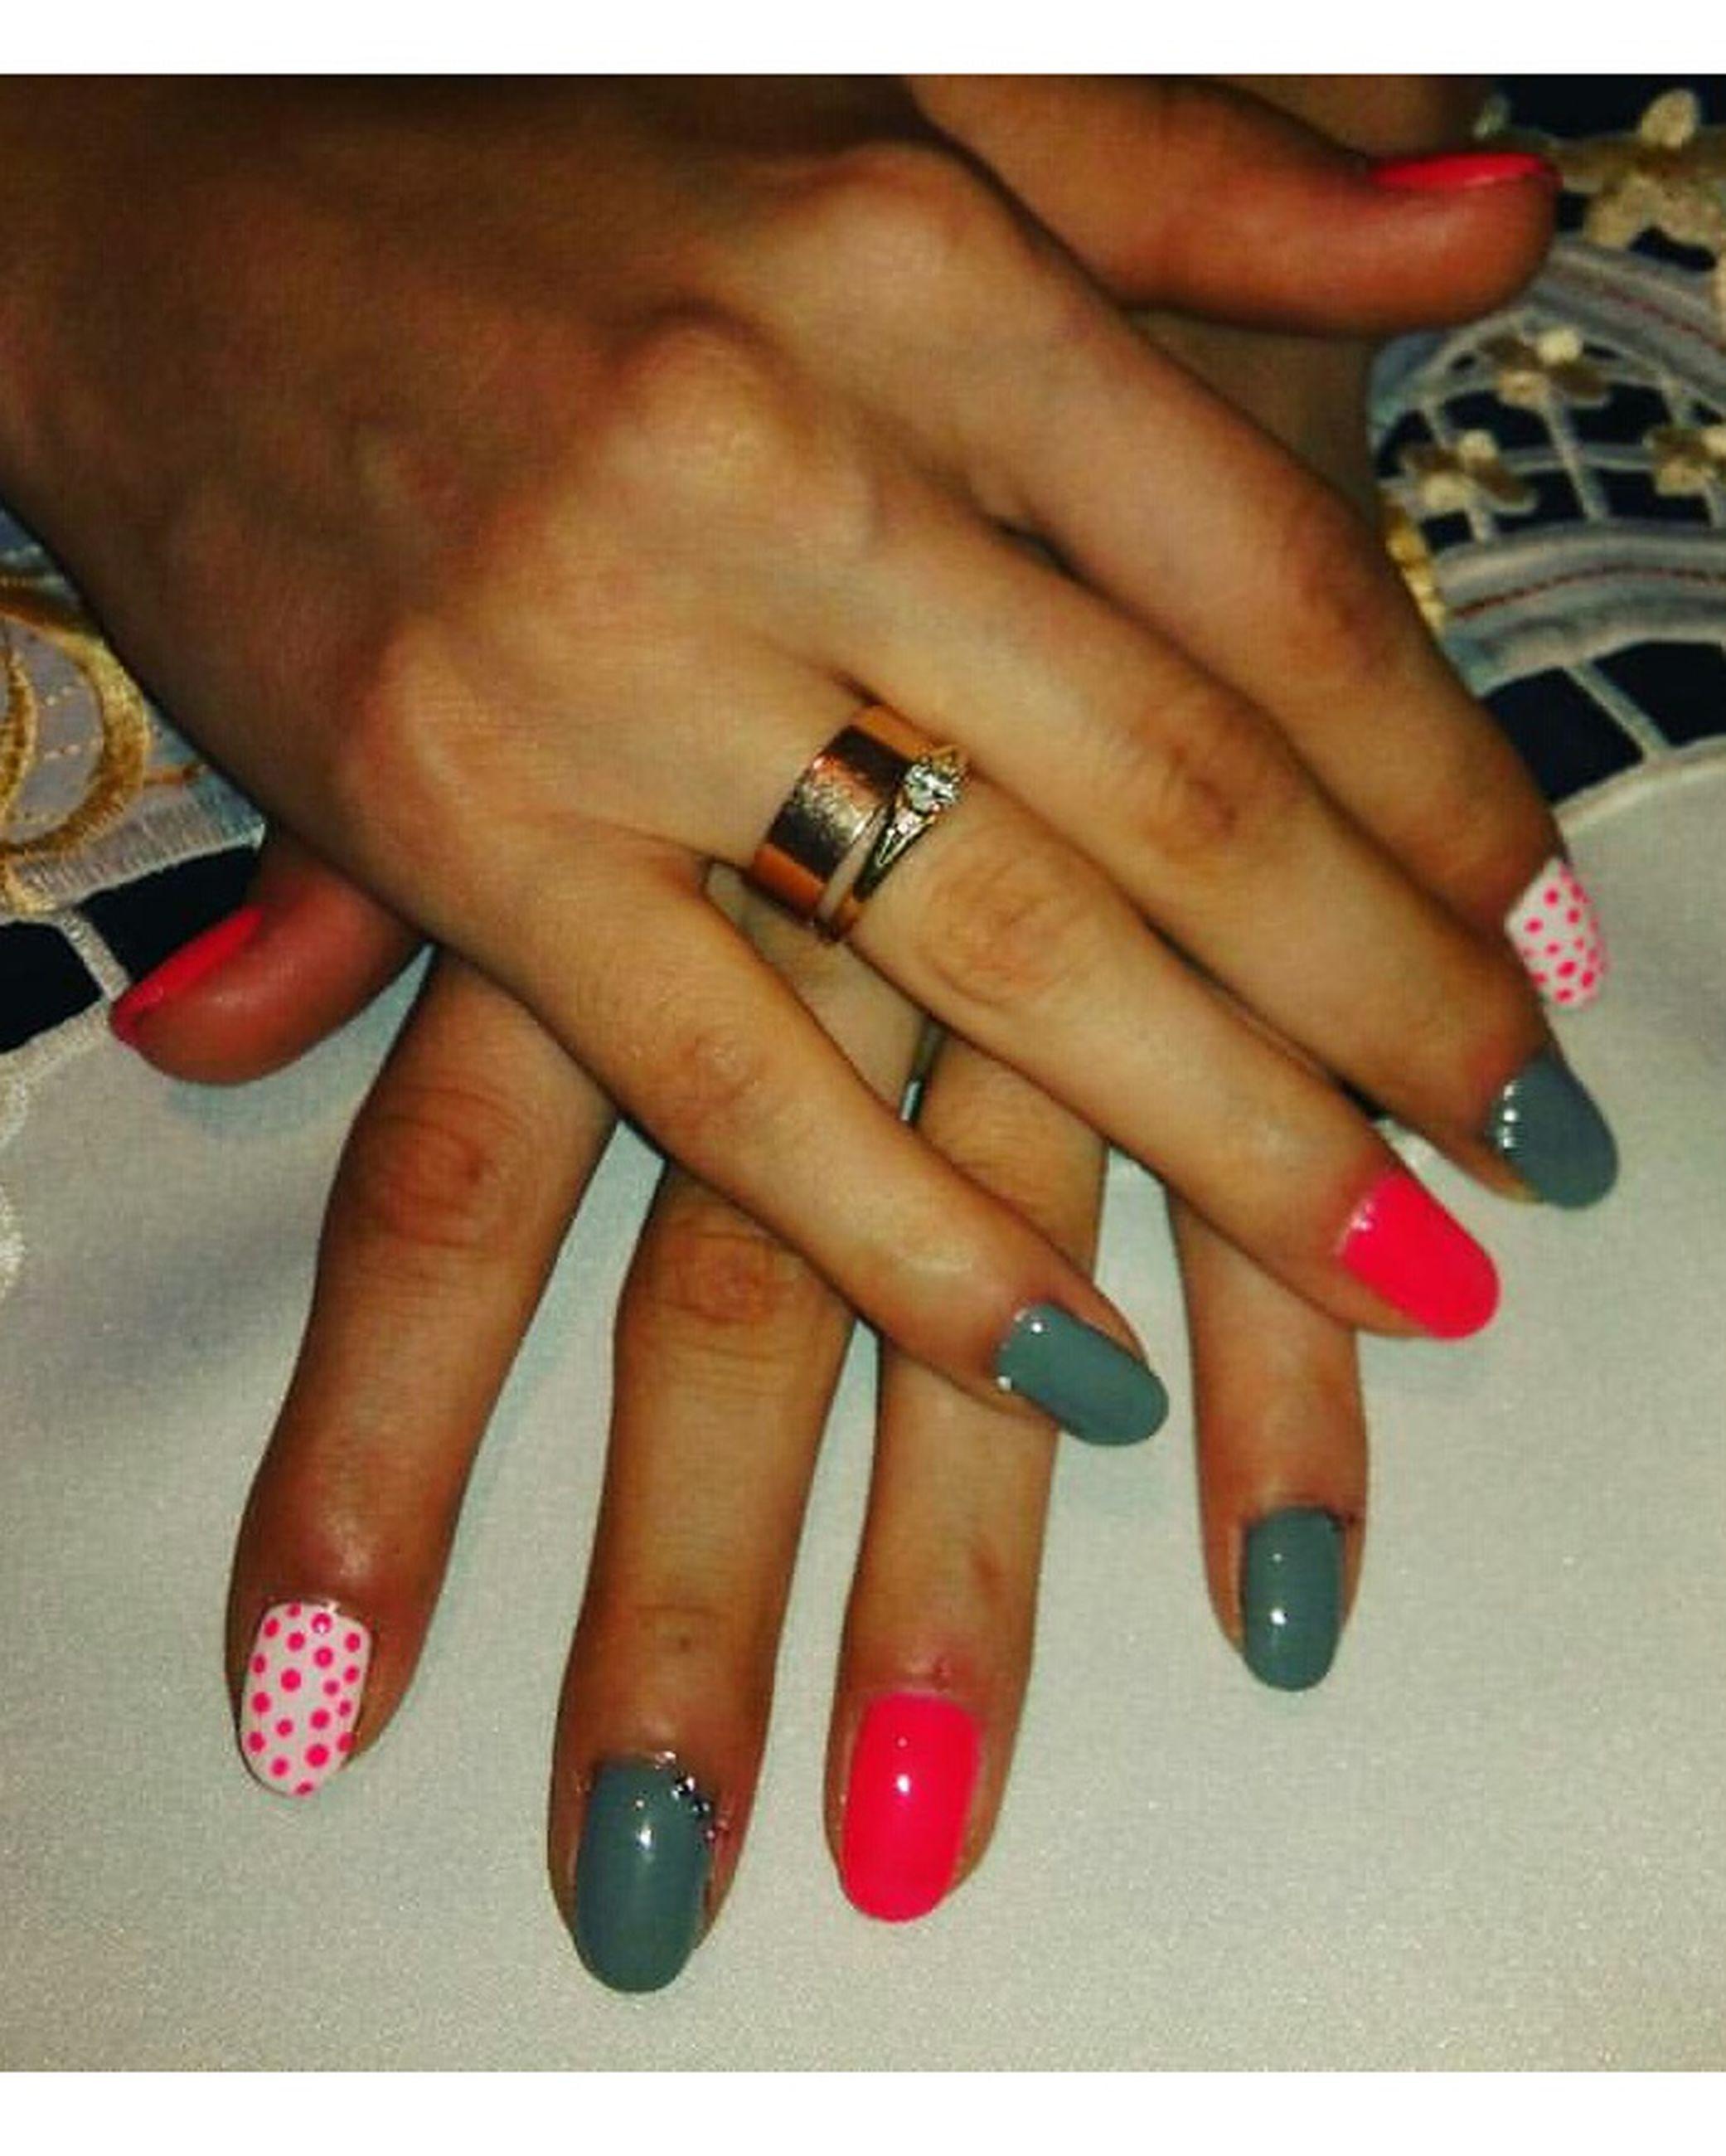 human body part, human hand, nail art, ring, close-up, people, adults only, fingernail, adult, nail polish, one person